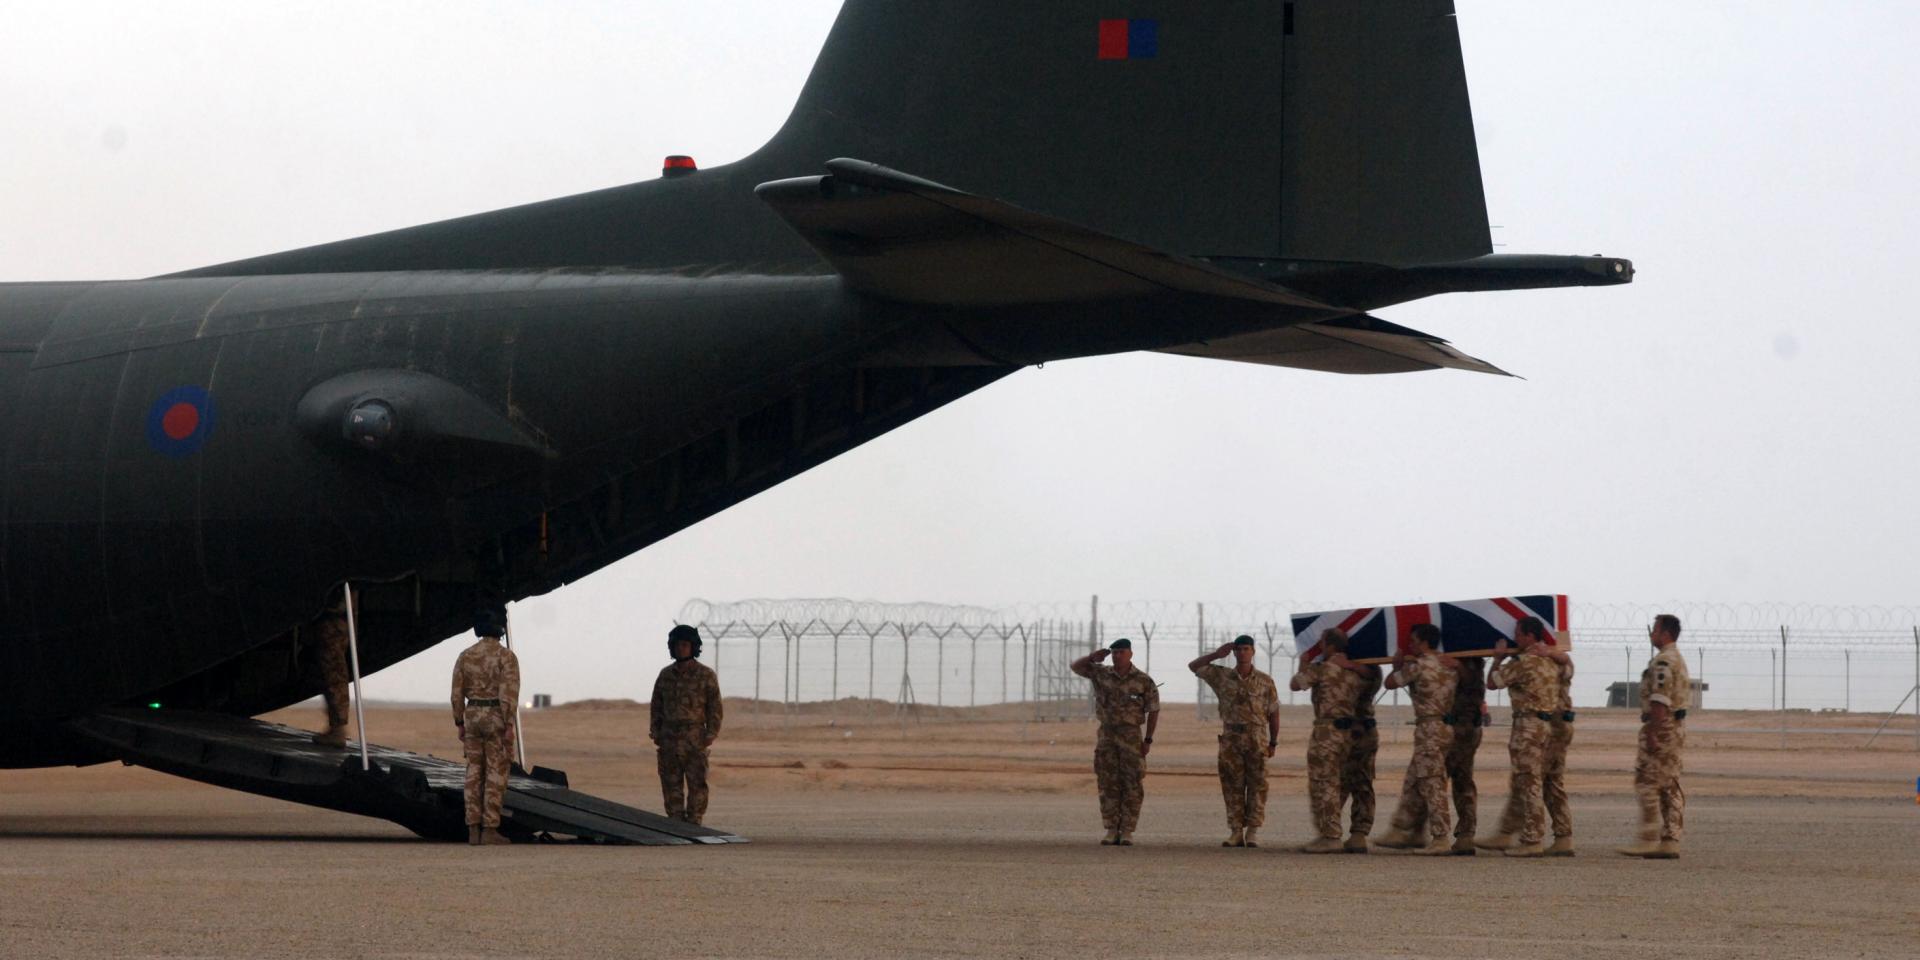 Repatriation service for Lt John Thornton and Marine Dave Marsh, Camp Bastion, Afghanistan, 3 April 2008